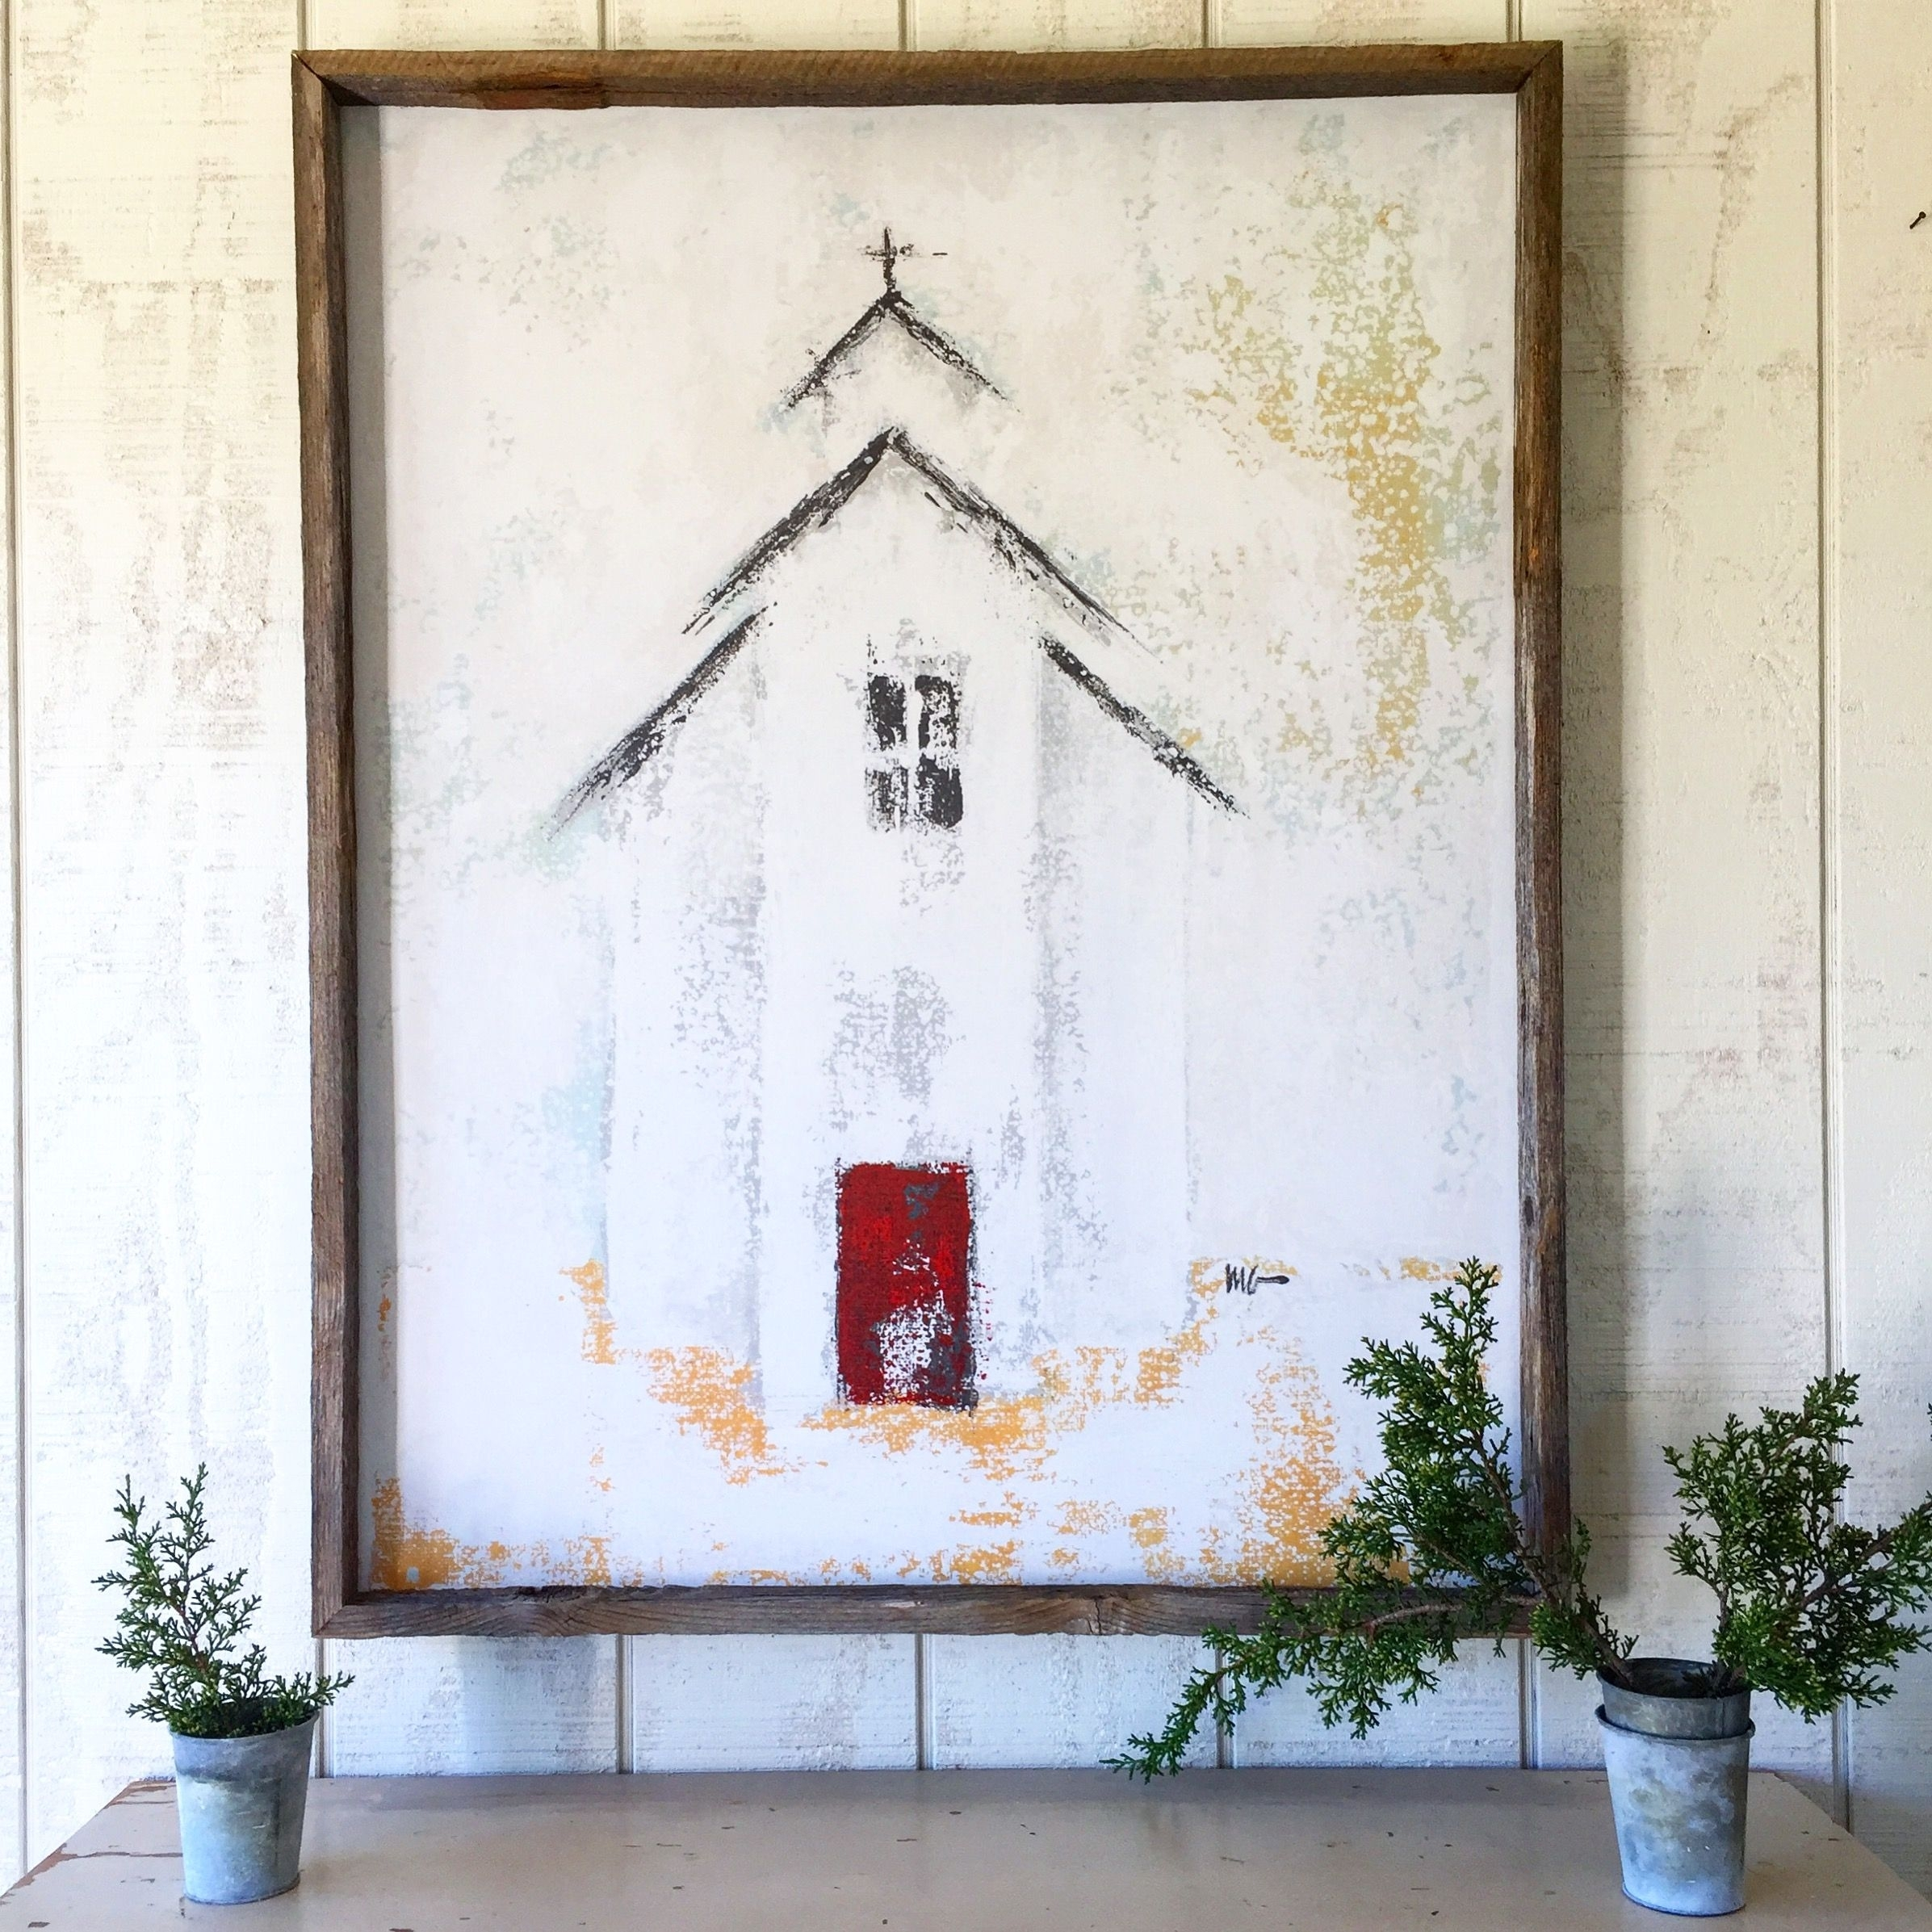 Christmas Church Framed Print | Den | Pinterest | Churches Regarding Current Christmas Framed Art Prints (View 5 of 15)